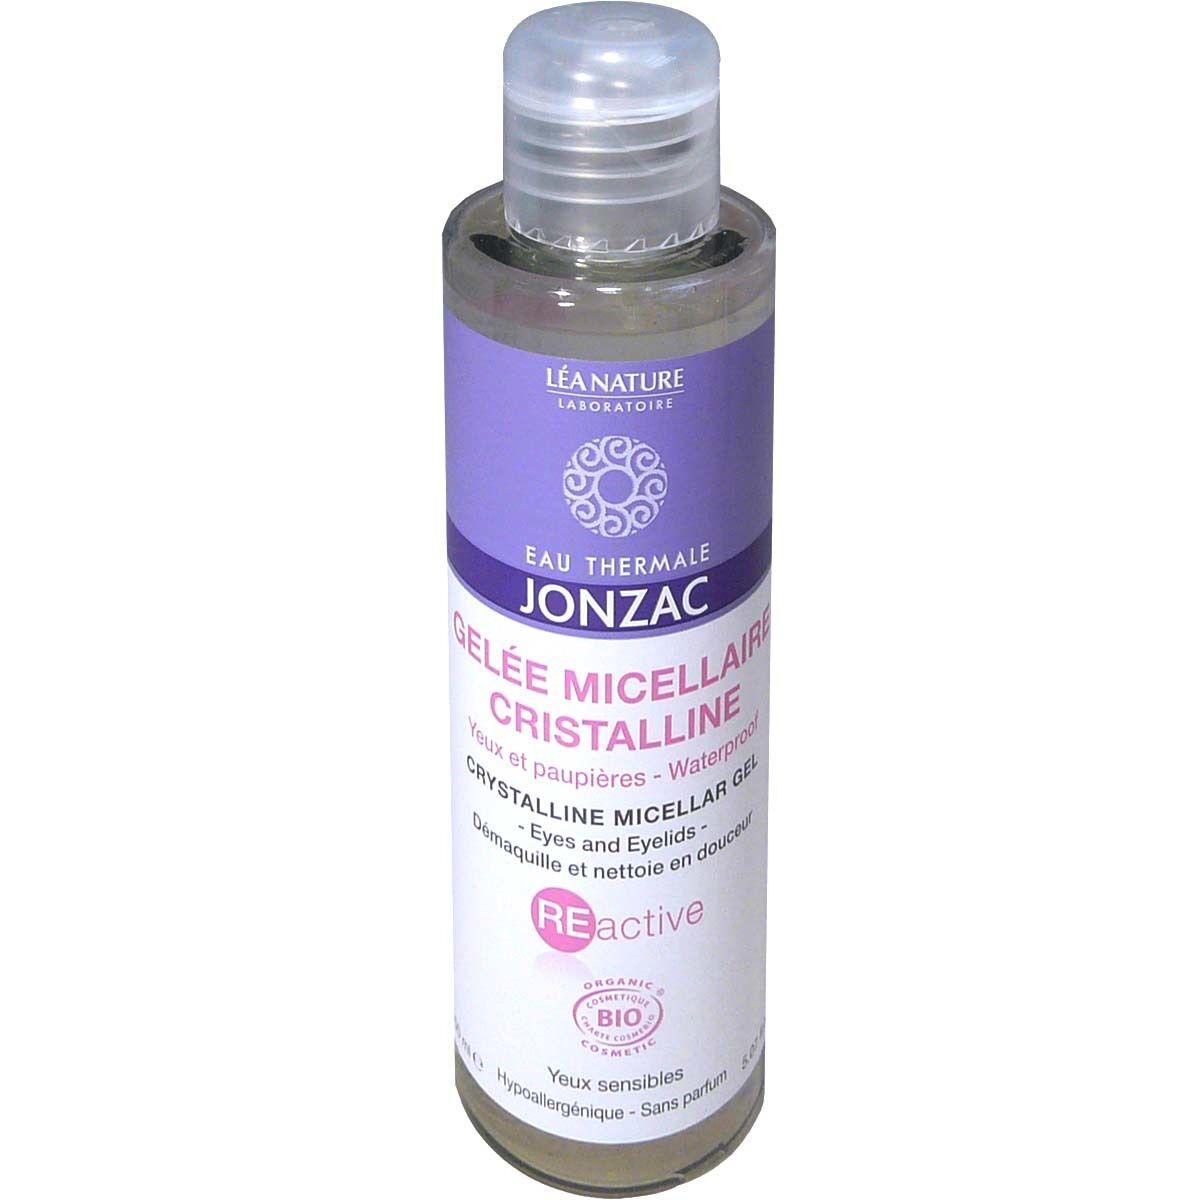 Jonzac gelee micellaire cristalline bio yeux et paupieres 150ml